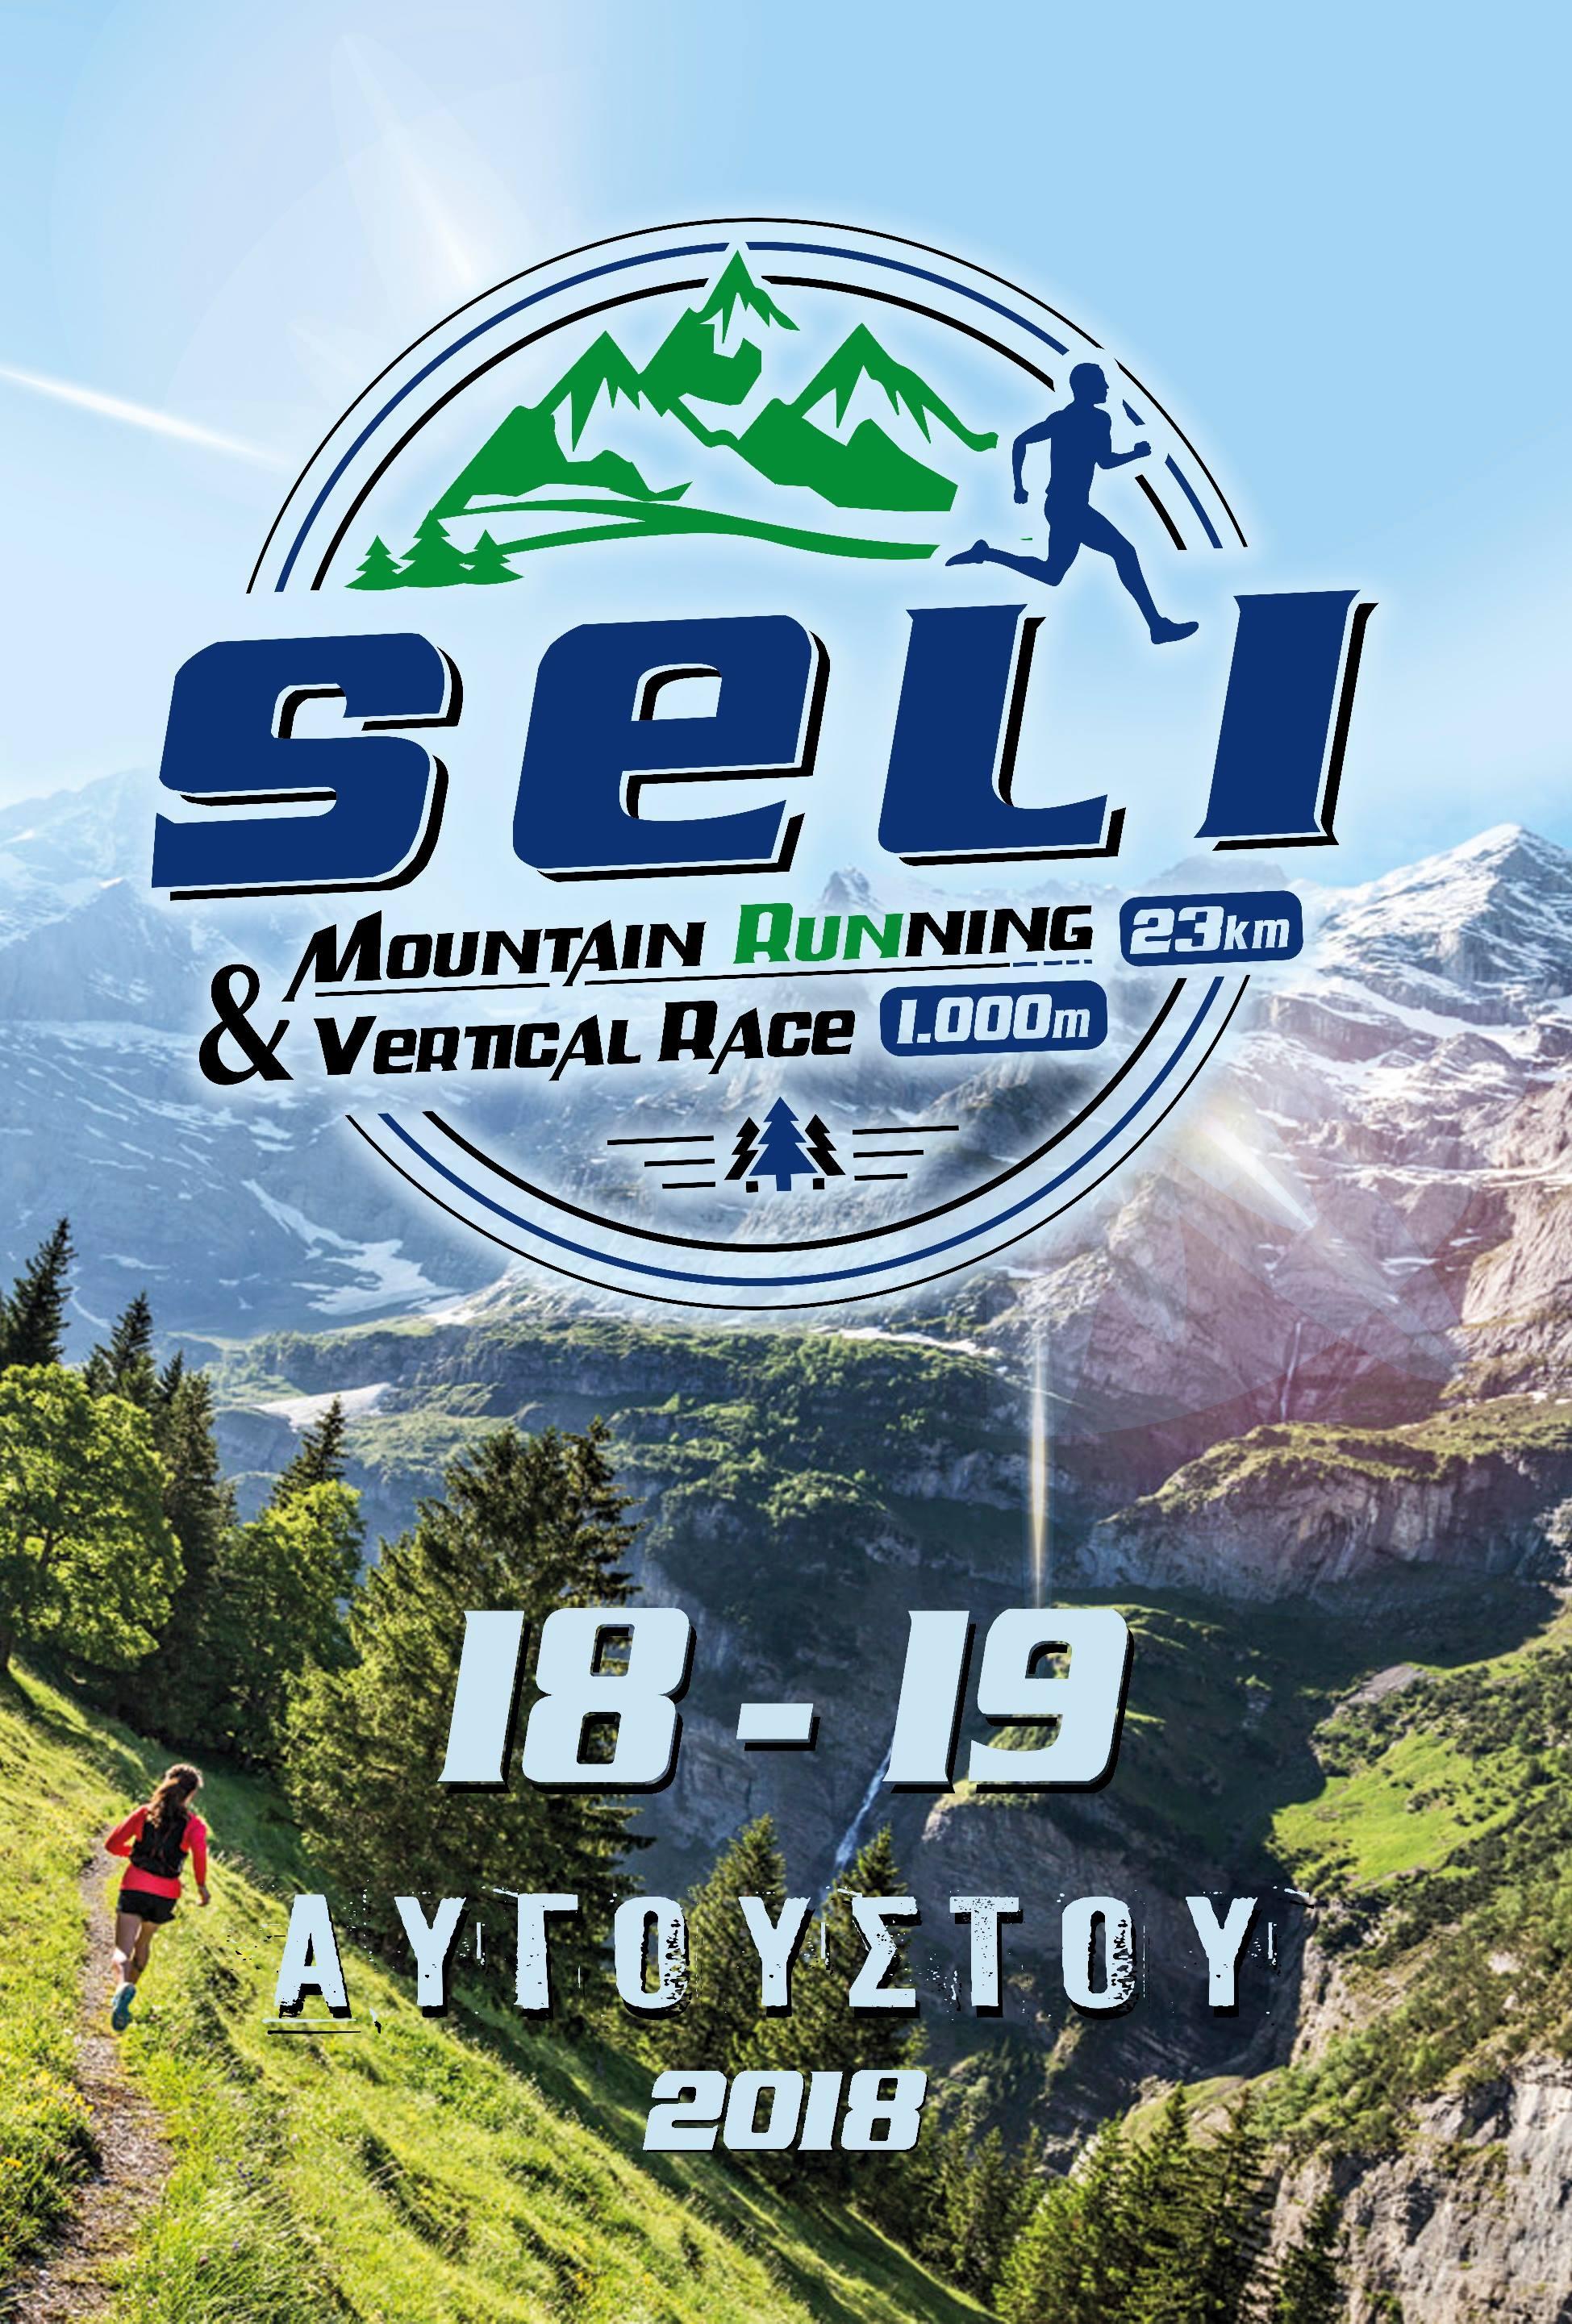 Seli mountain running 23χλμ & Vertical race 1χλμ - Σάββατο 18 και Κυριακή 19 Αυγούστου